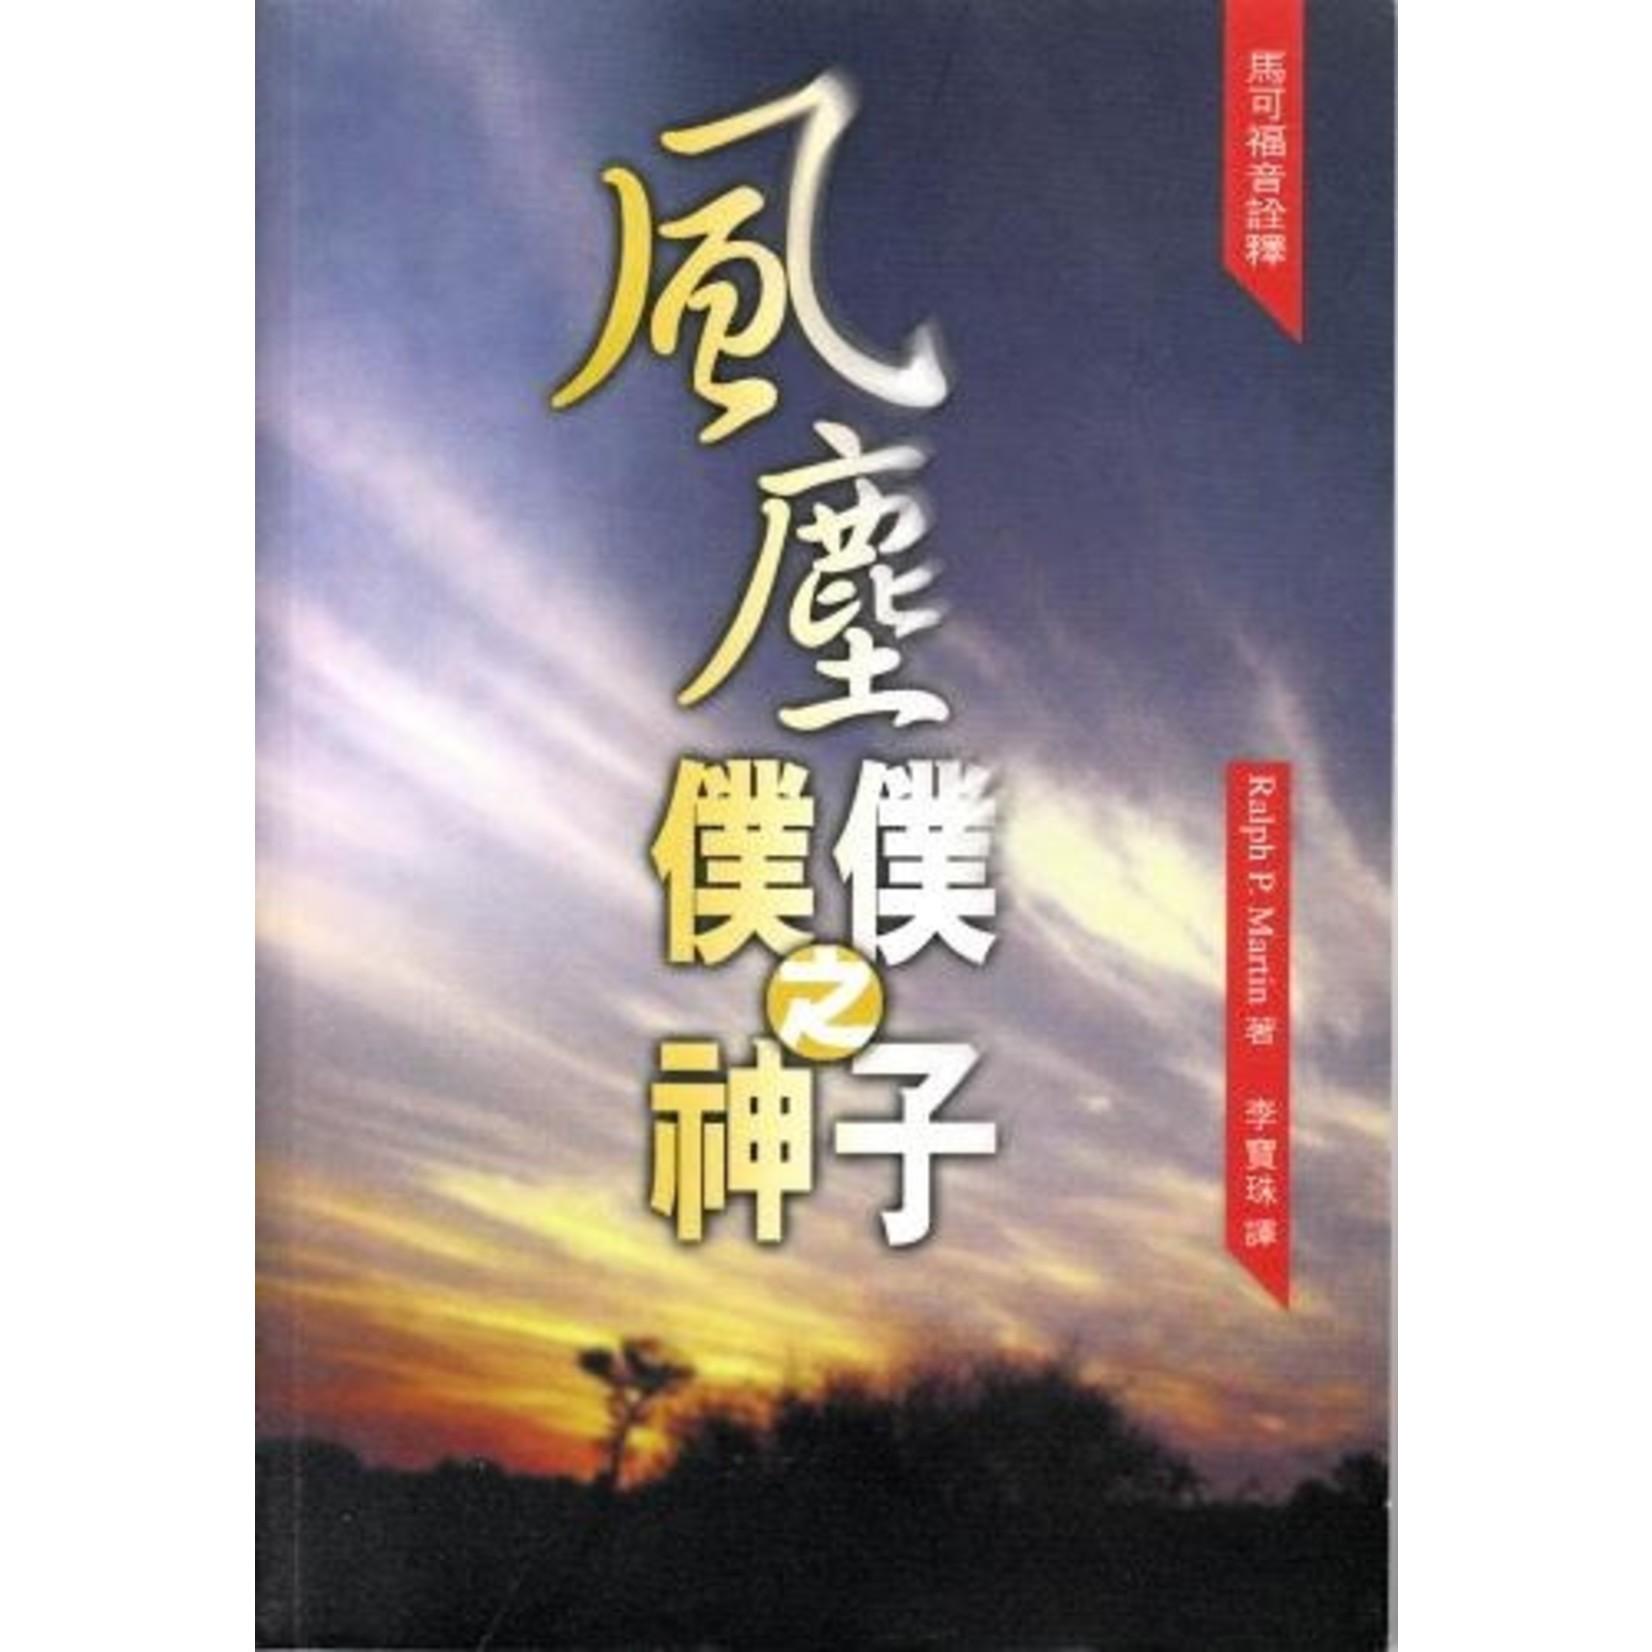 台福傳播中心 Evangelical Formosan Church Communication Center 風塵僕僕之神子:馬可福音詮釋 Where the Action Is